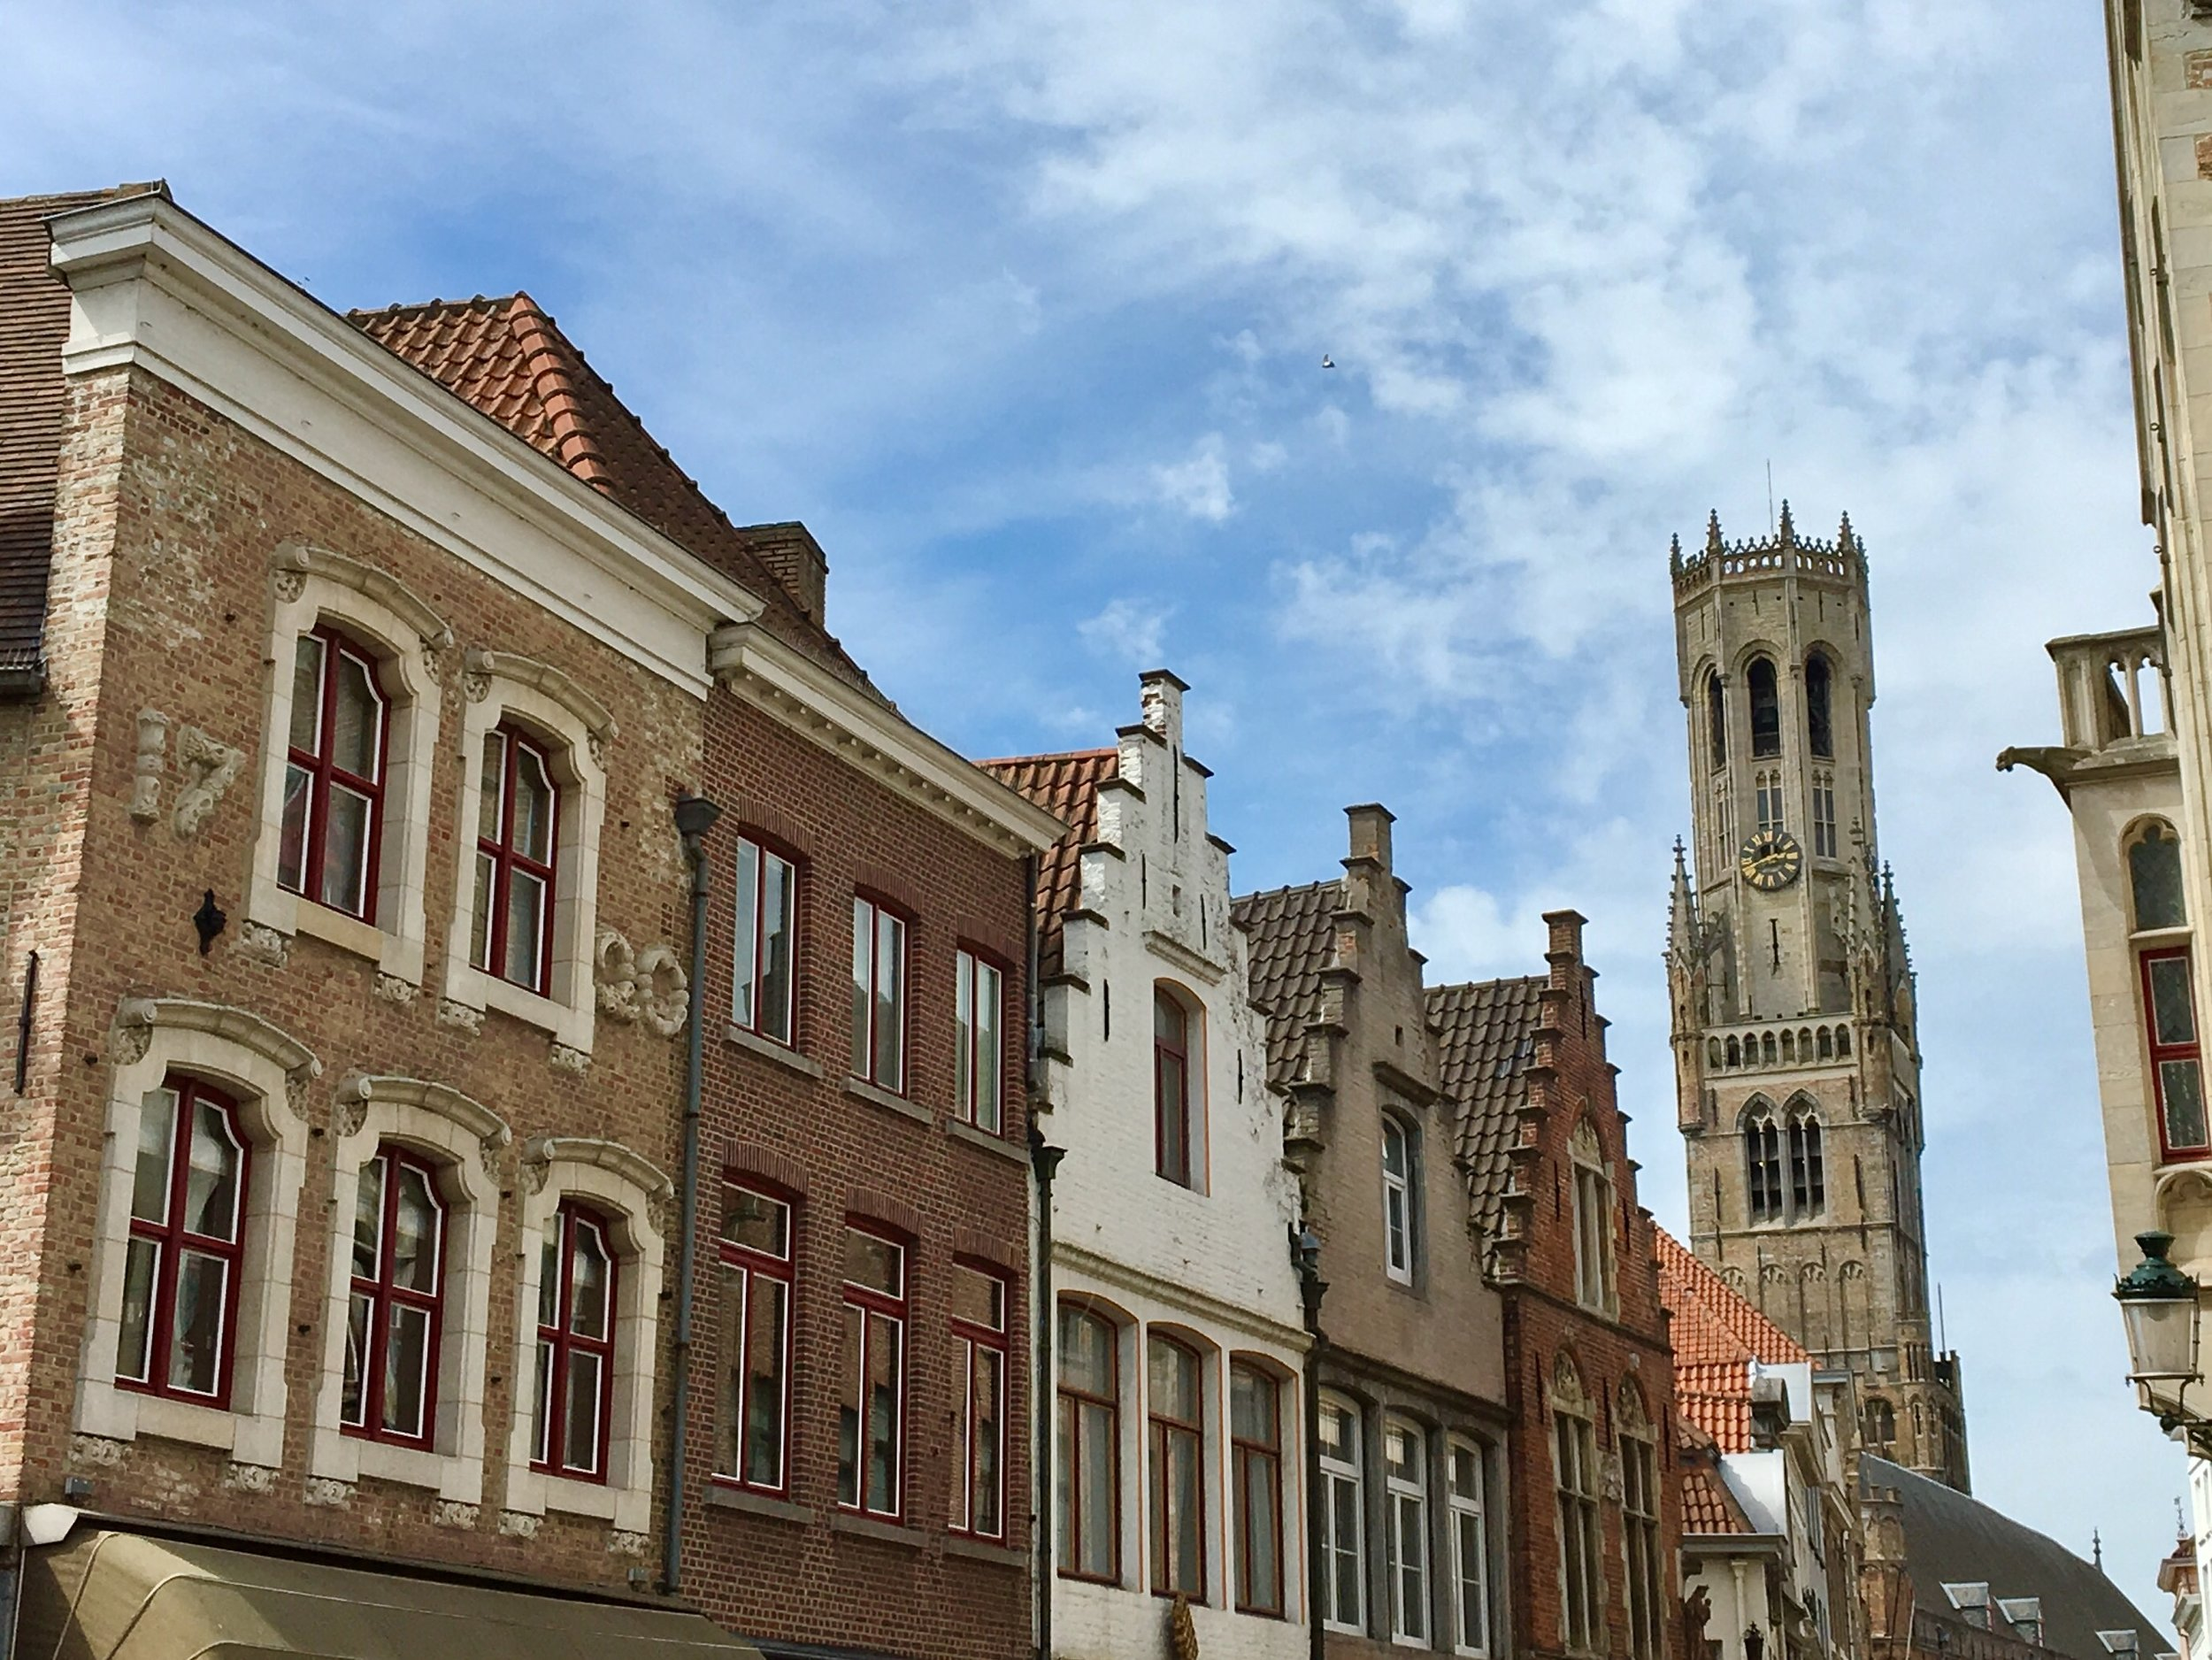 UNESCO Heritage Centre of Bruges